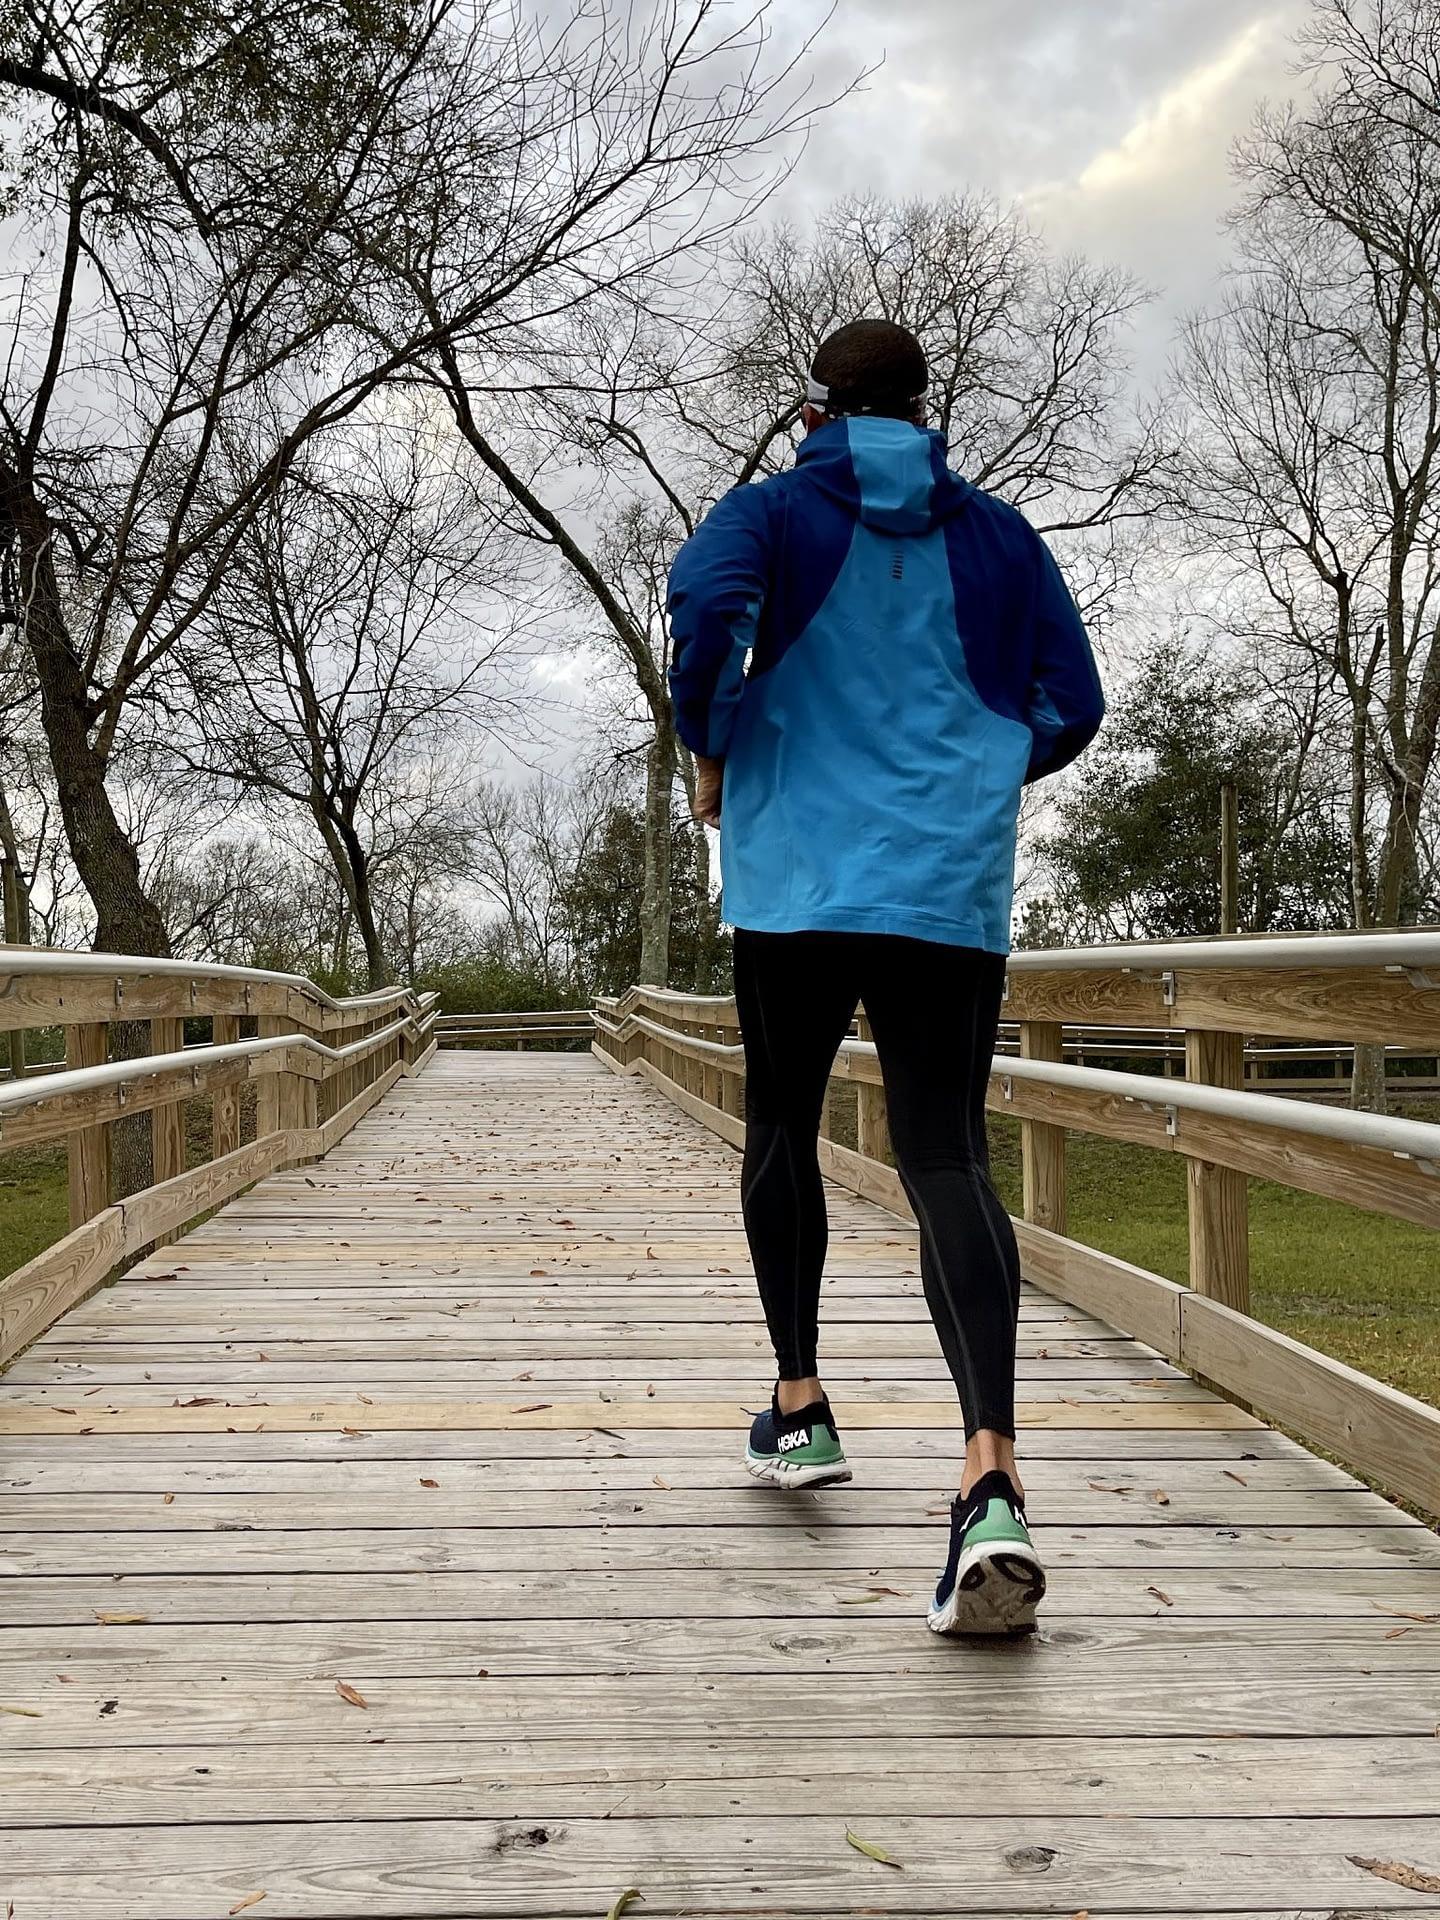 Surprise Improvement in Run Performance